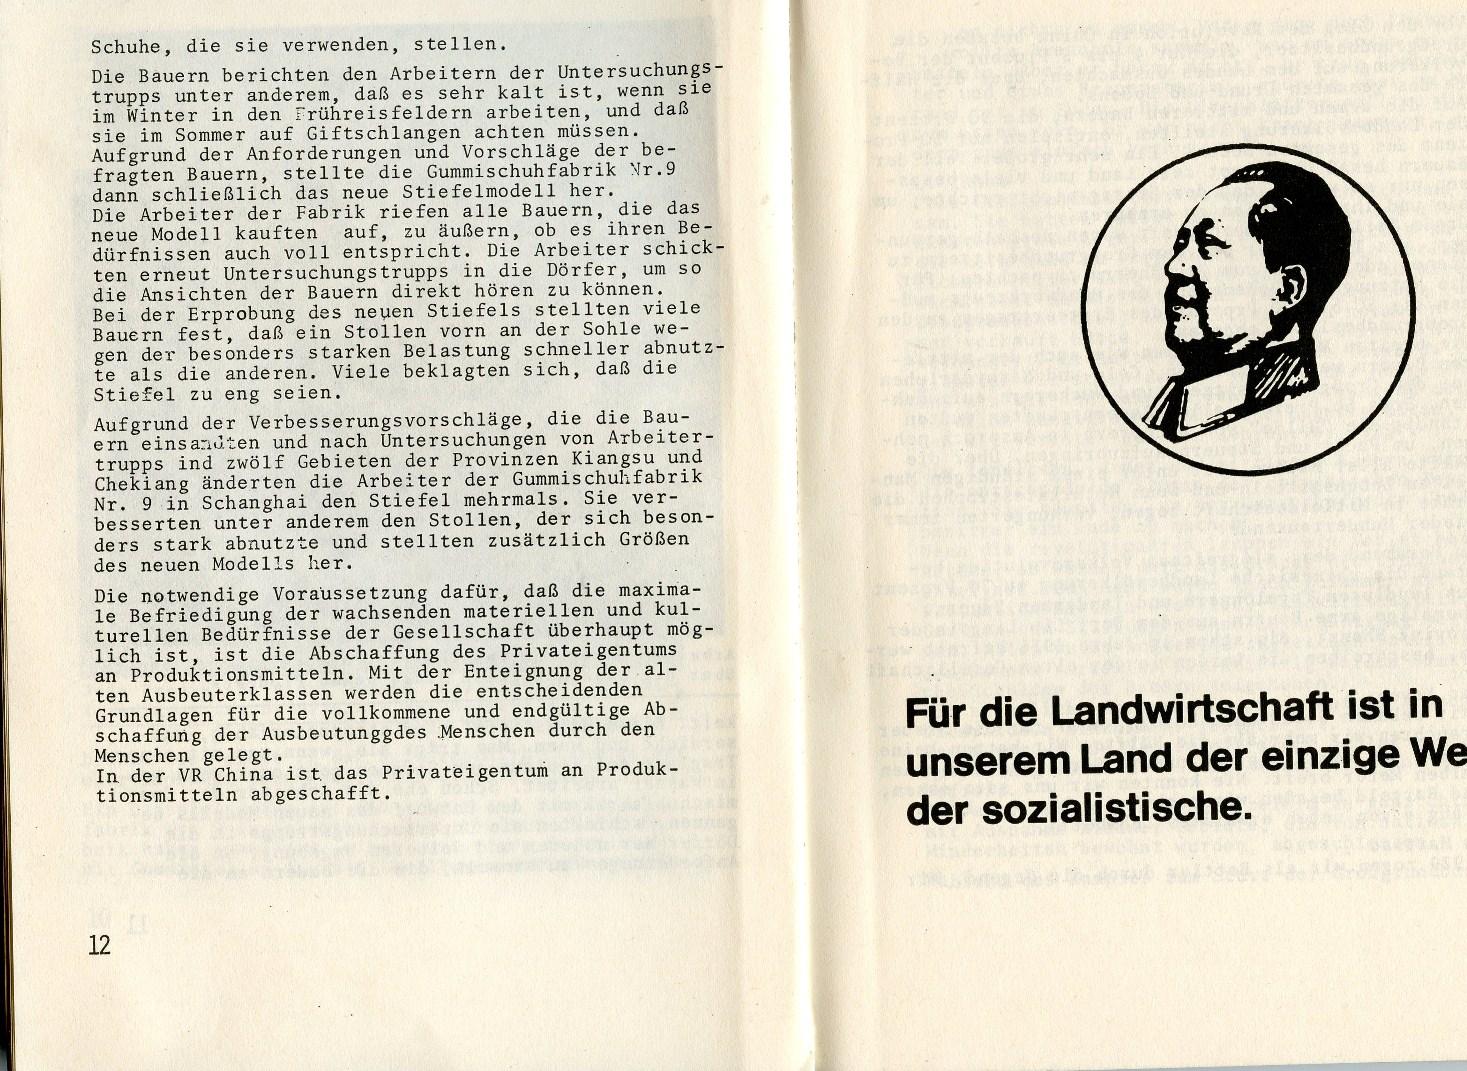 ZB_KPChinas_1971_08